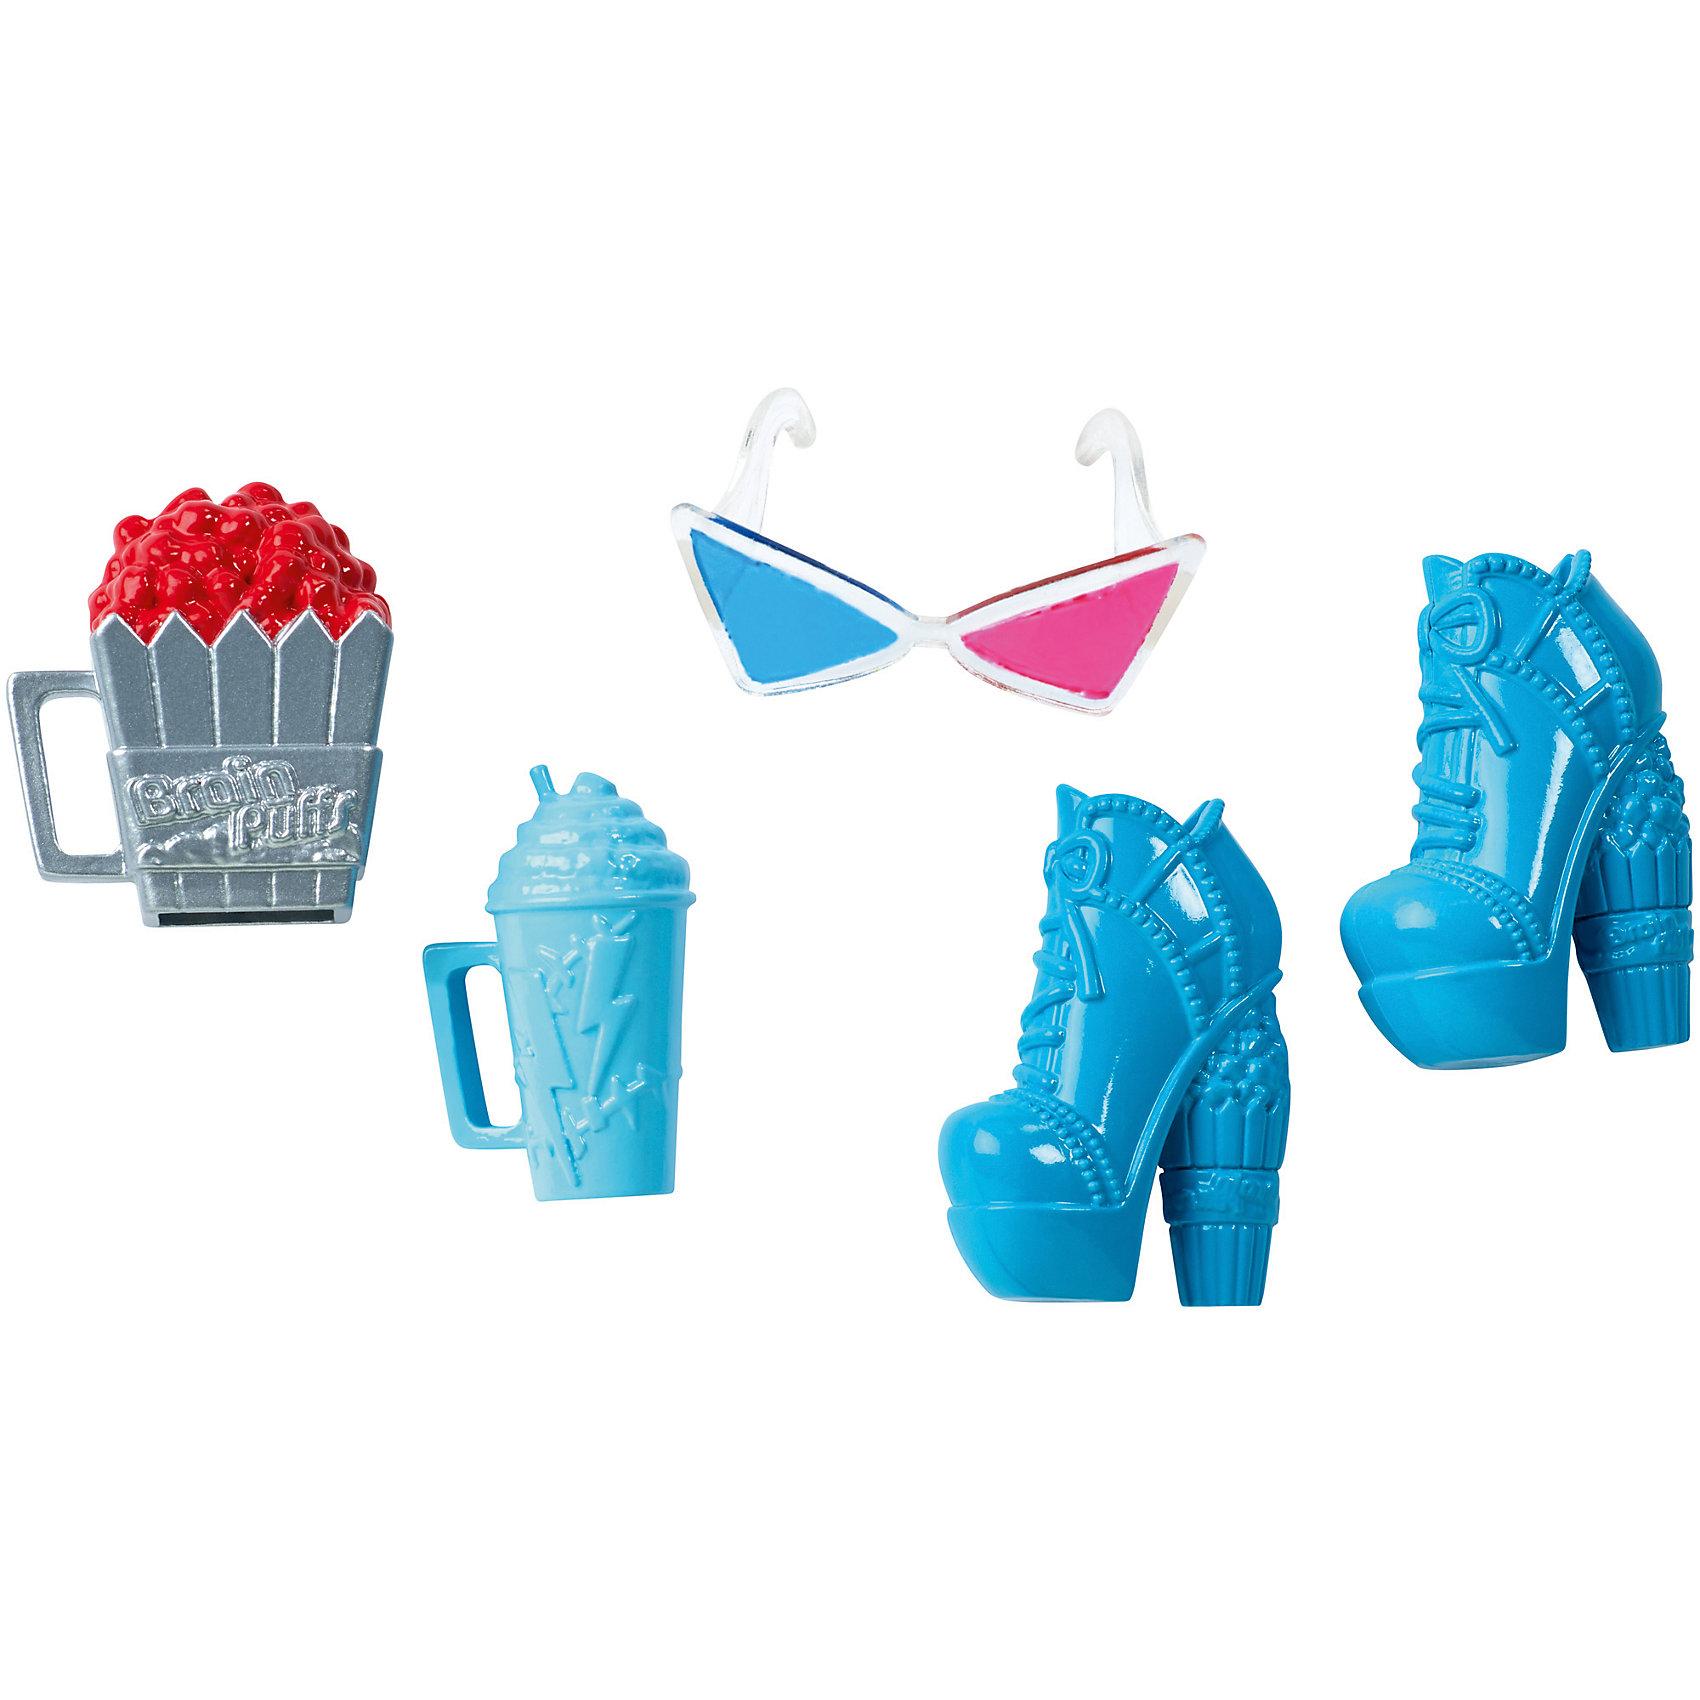 Набор аксессуаров , Monster HighПопулярные игрушки<br><br><br>Ширина мм: 15<br>Глубина мм: 75<br>Высота мм: 150<br>Вес г: 43<br>Возраст от месяцев: 72<br>Возраст до месяцев: 144<br>Пол: Женский<br>Возраст: Детский<br>SKU: 4953560